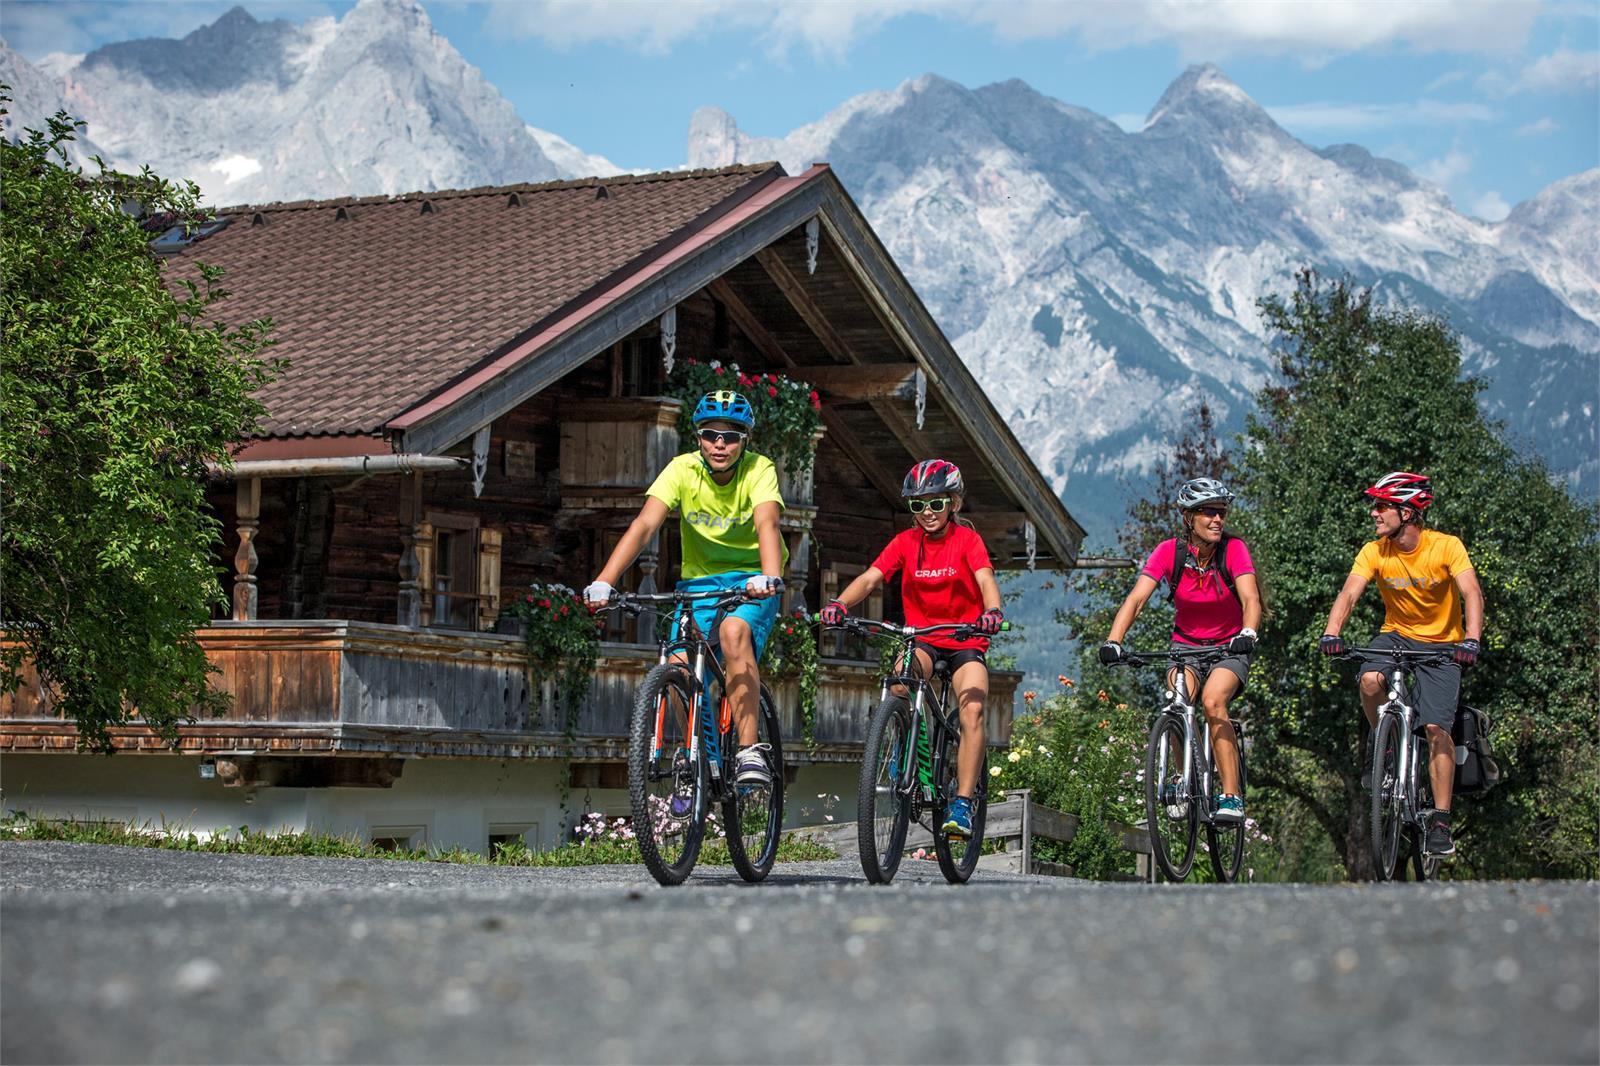 Familien-Radtour   ©Salzburgerland Tourismus - Markus Greber